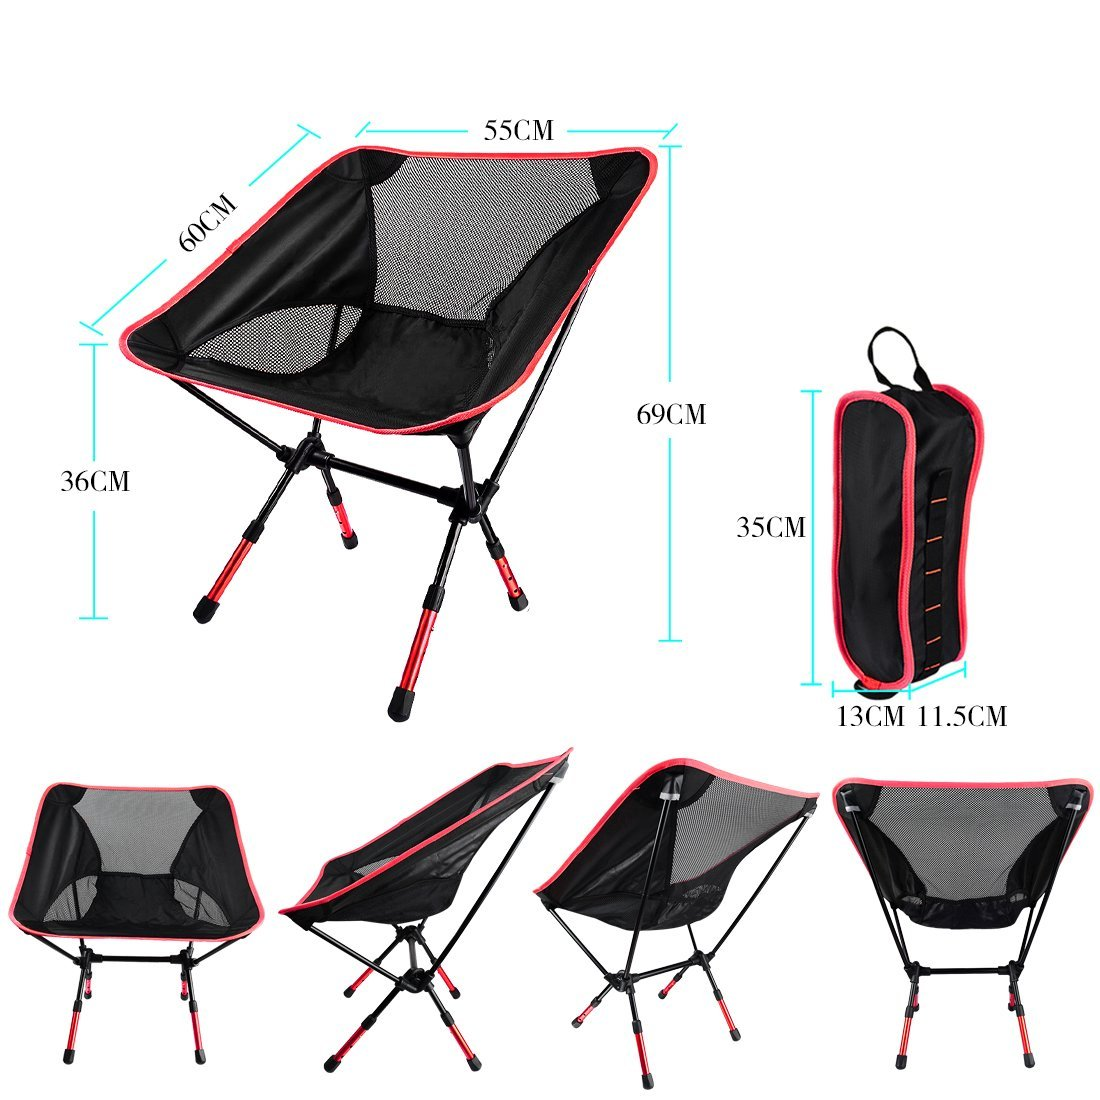 NOTENS Silla de Camping Plegable Ultraligero Mochilas al Aire Libre para recreo Respaldo 3 Niveles Altura Ajustable Silla compacta de hasta 150 KG para la Pesca Escalada